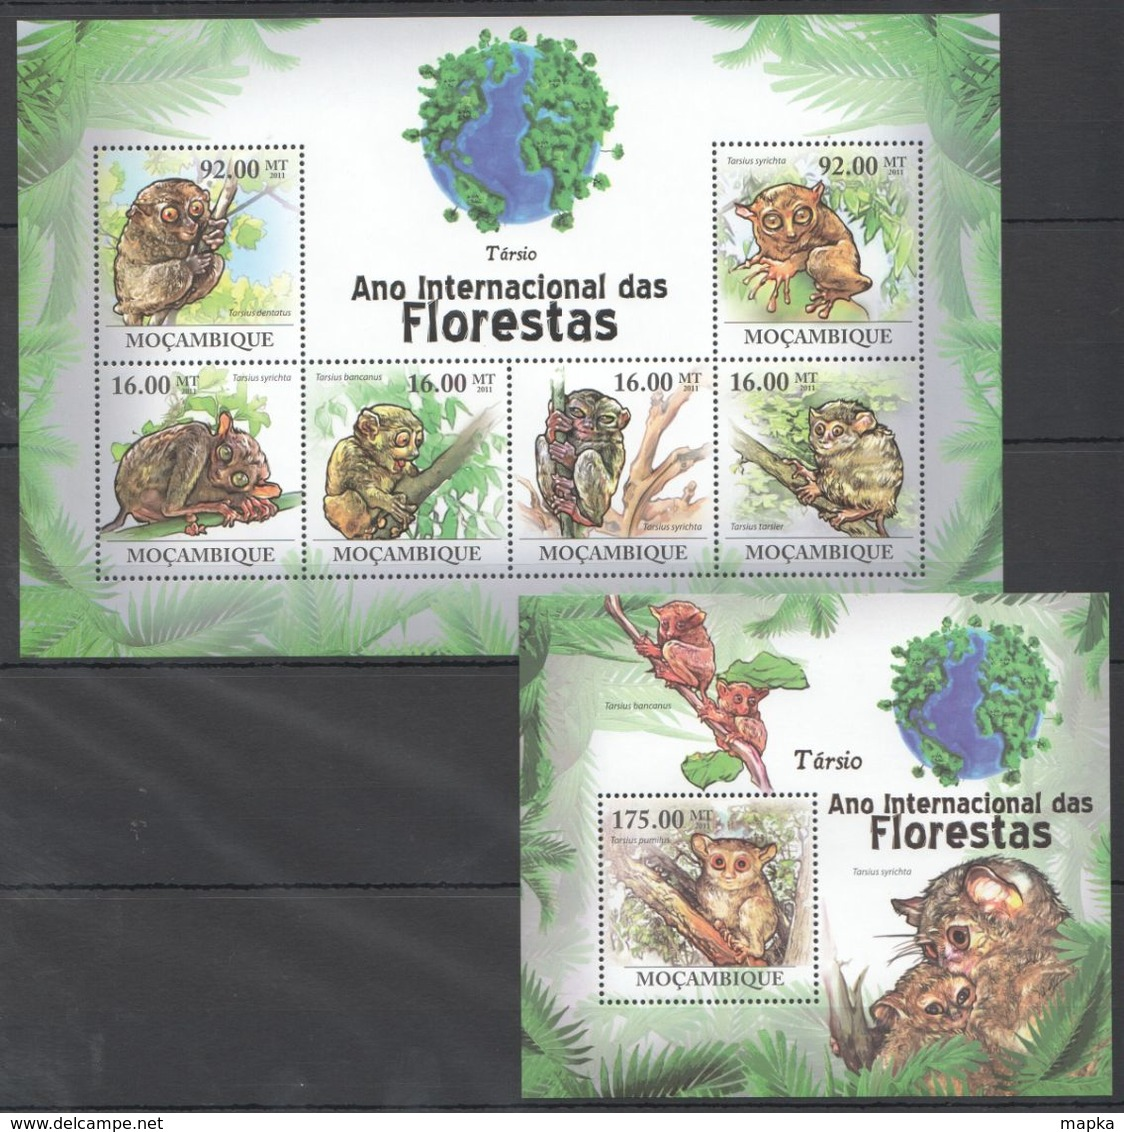 QQ120 2011 MOZAMBIQUE MOCAMBIQUE FAUNA DAS FLORESTAS ANIMALS TARSIO 1SH+1BL MNH - Scimmie